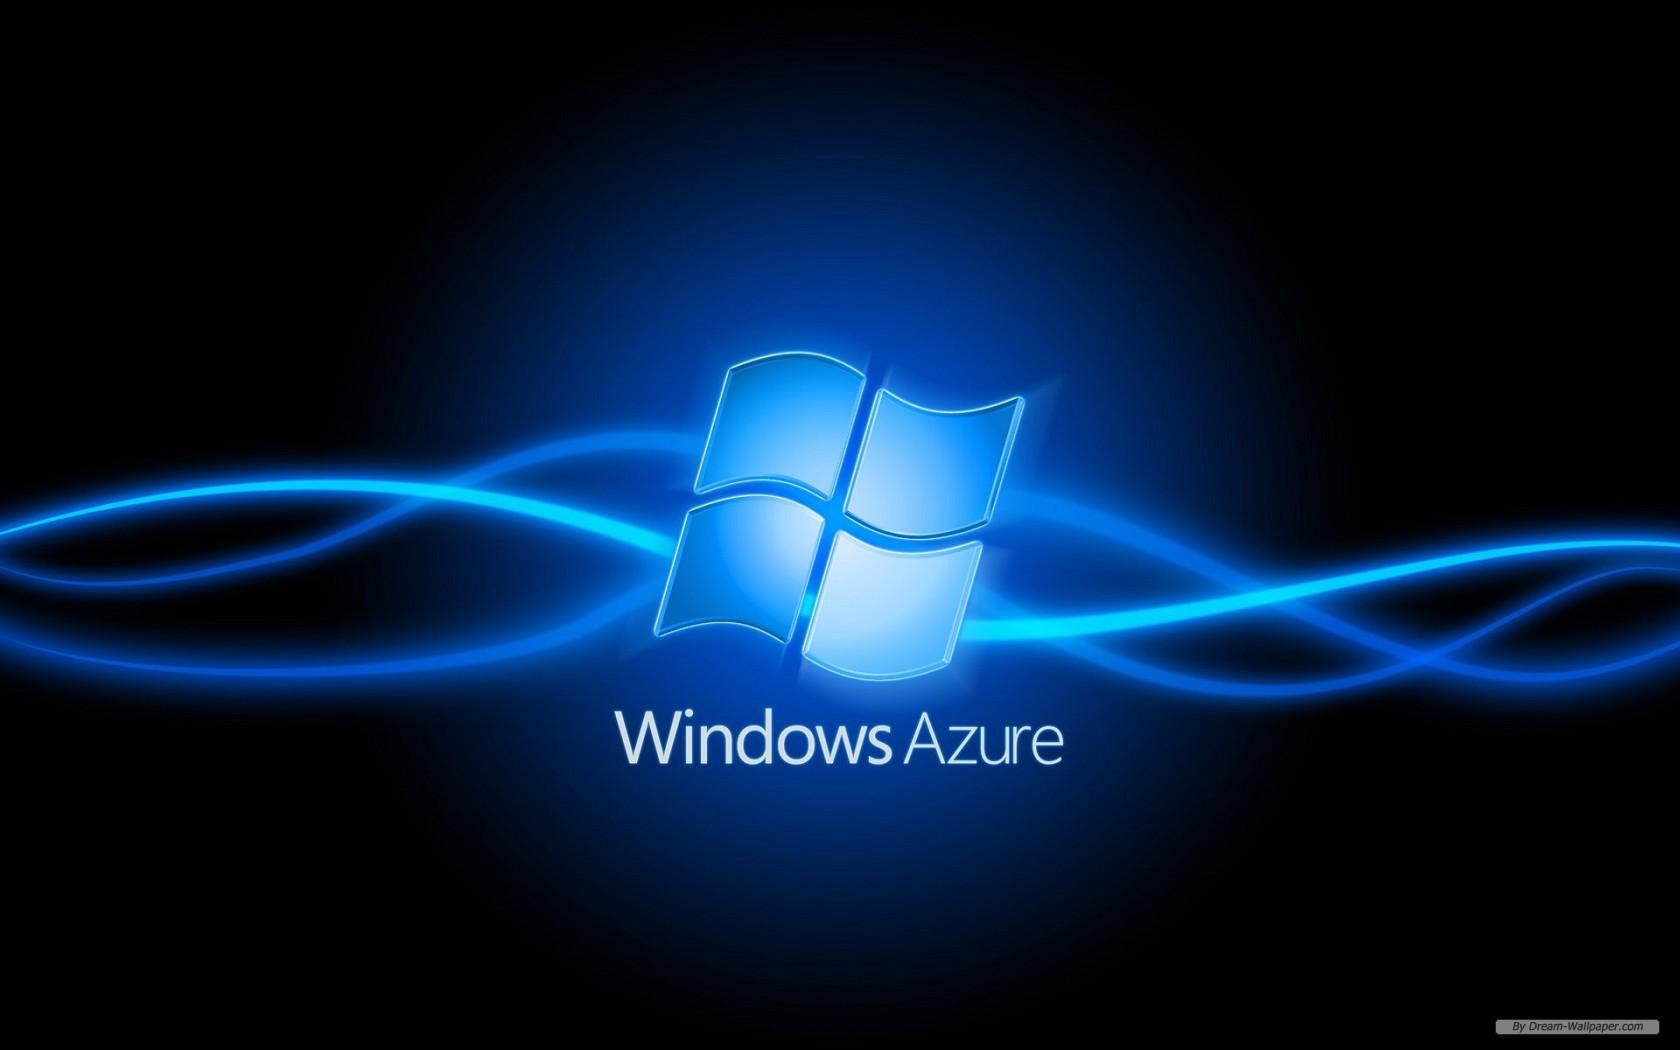 Windows7 Theme Wallpaper 1 wallpaper   1680x1050 wallpaper   Index 10 1680x1050